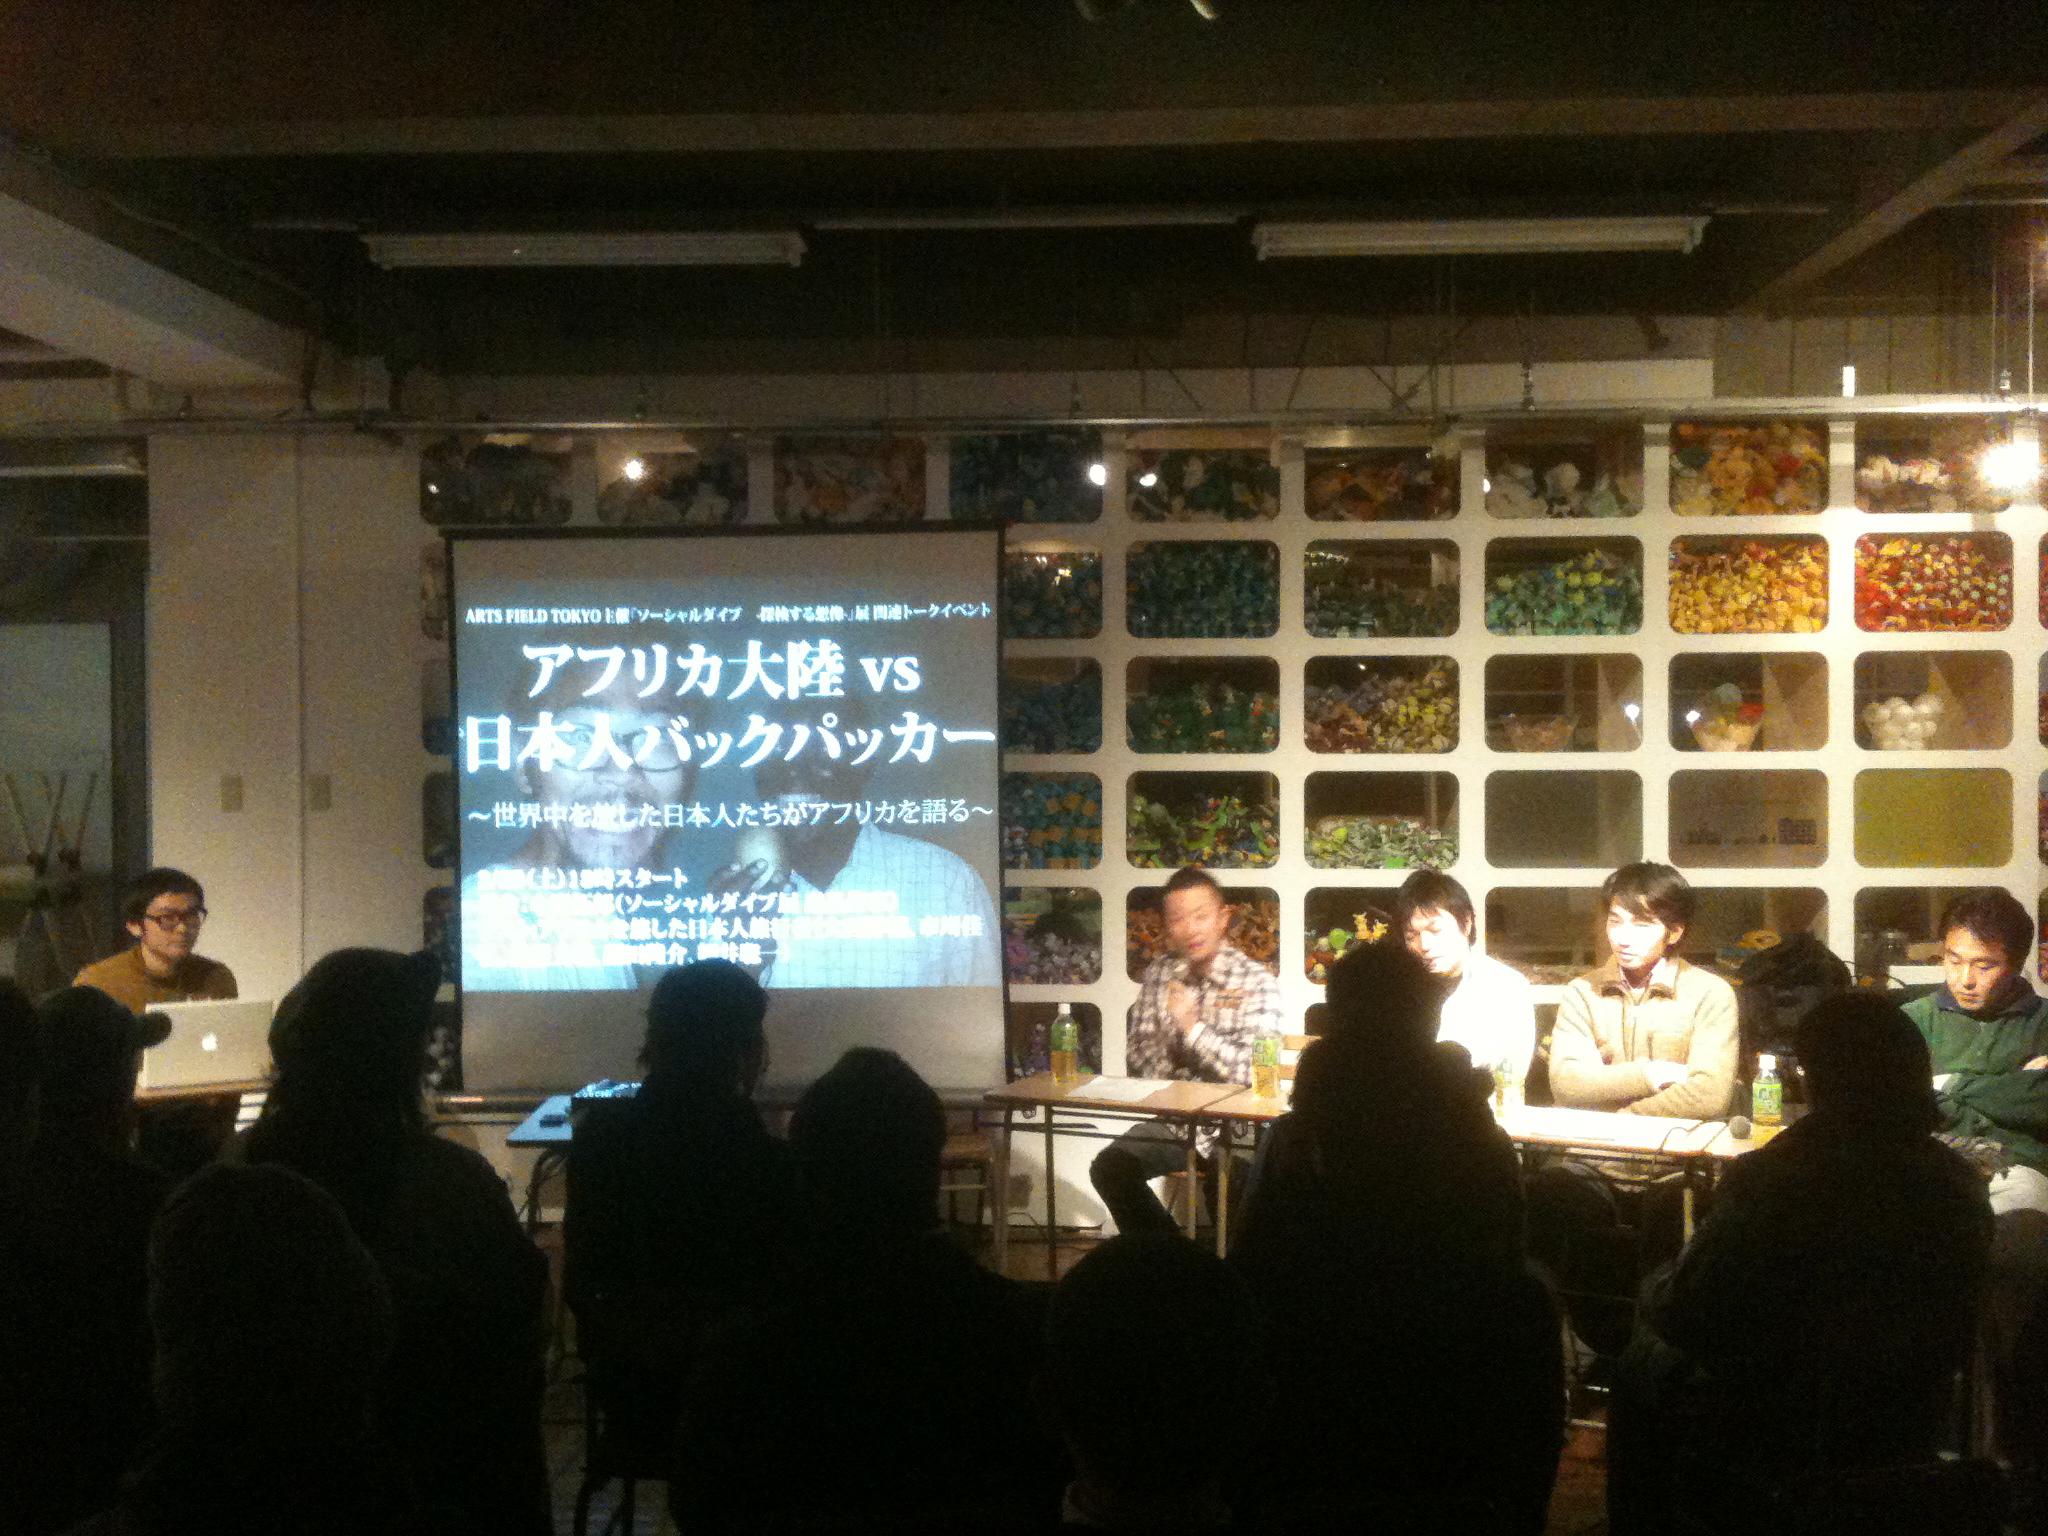 http://2010.artsfield.jp/blog/photo/kotaka_01.jpg